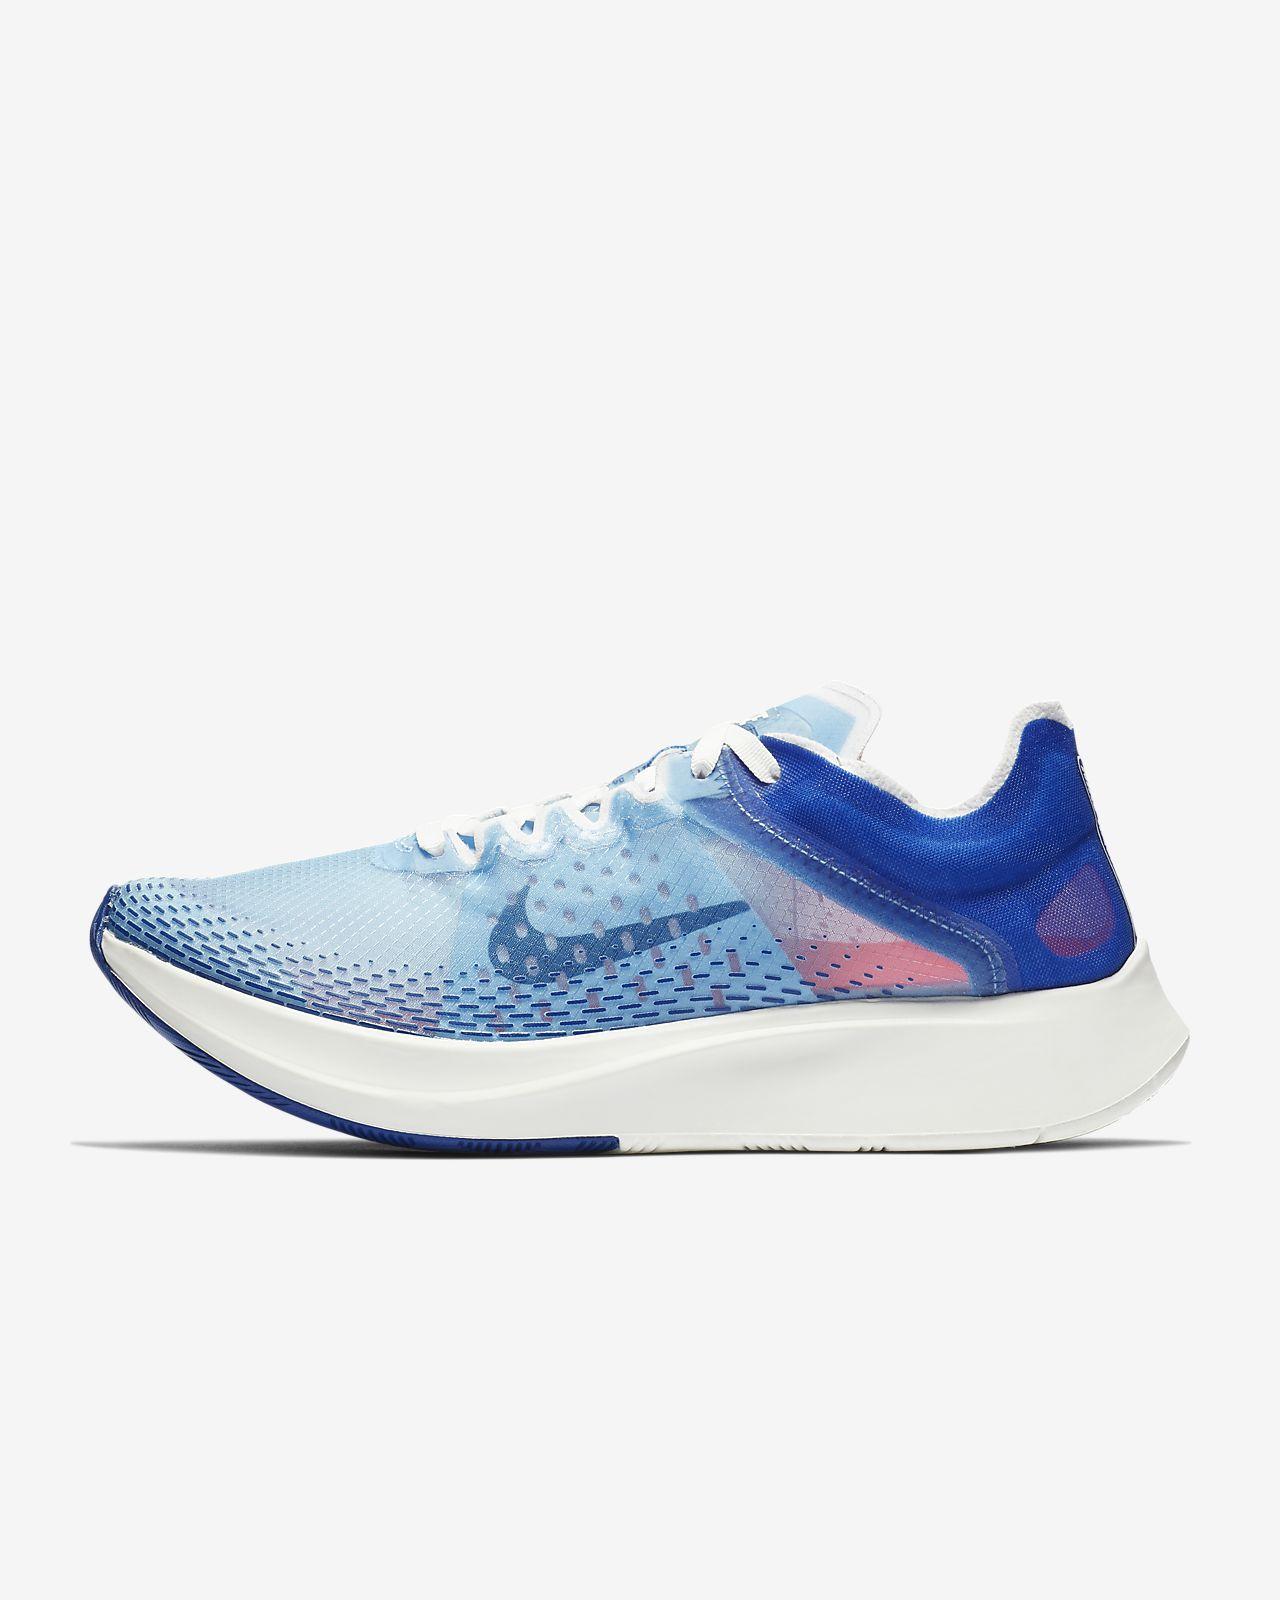 Nike Zoom Fly SP Fast Zapatillas de running - Mujer